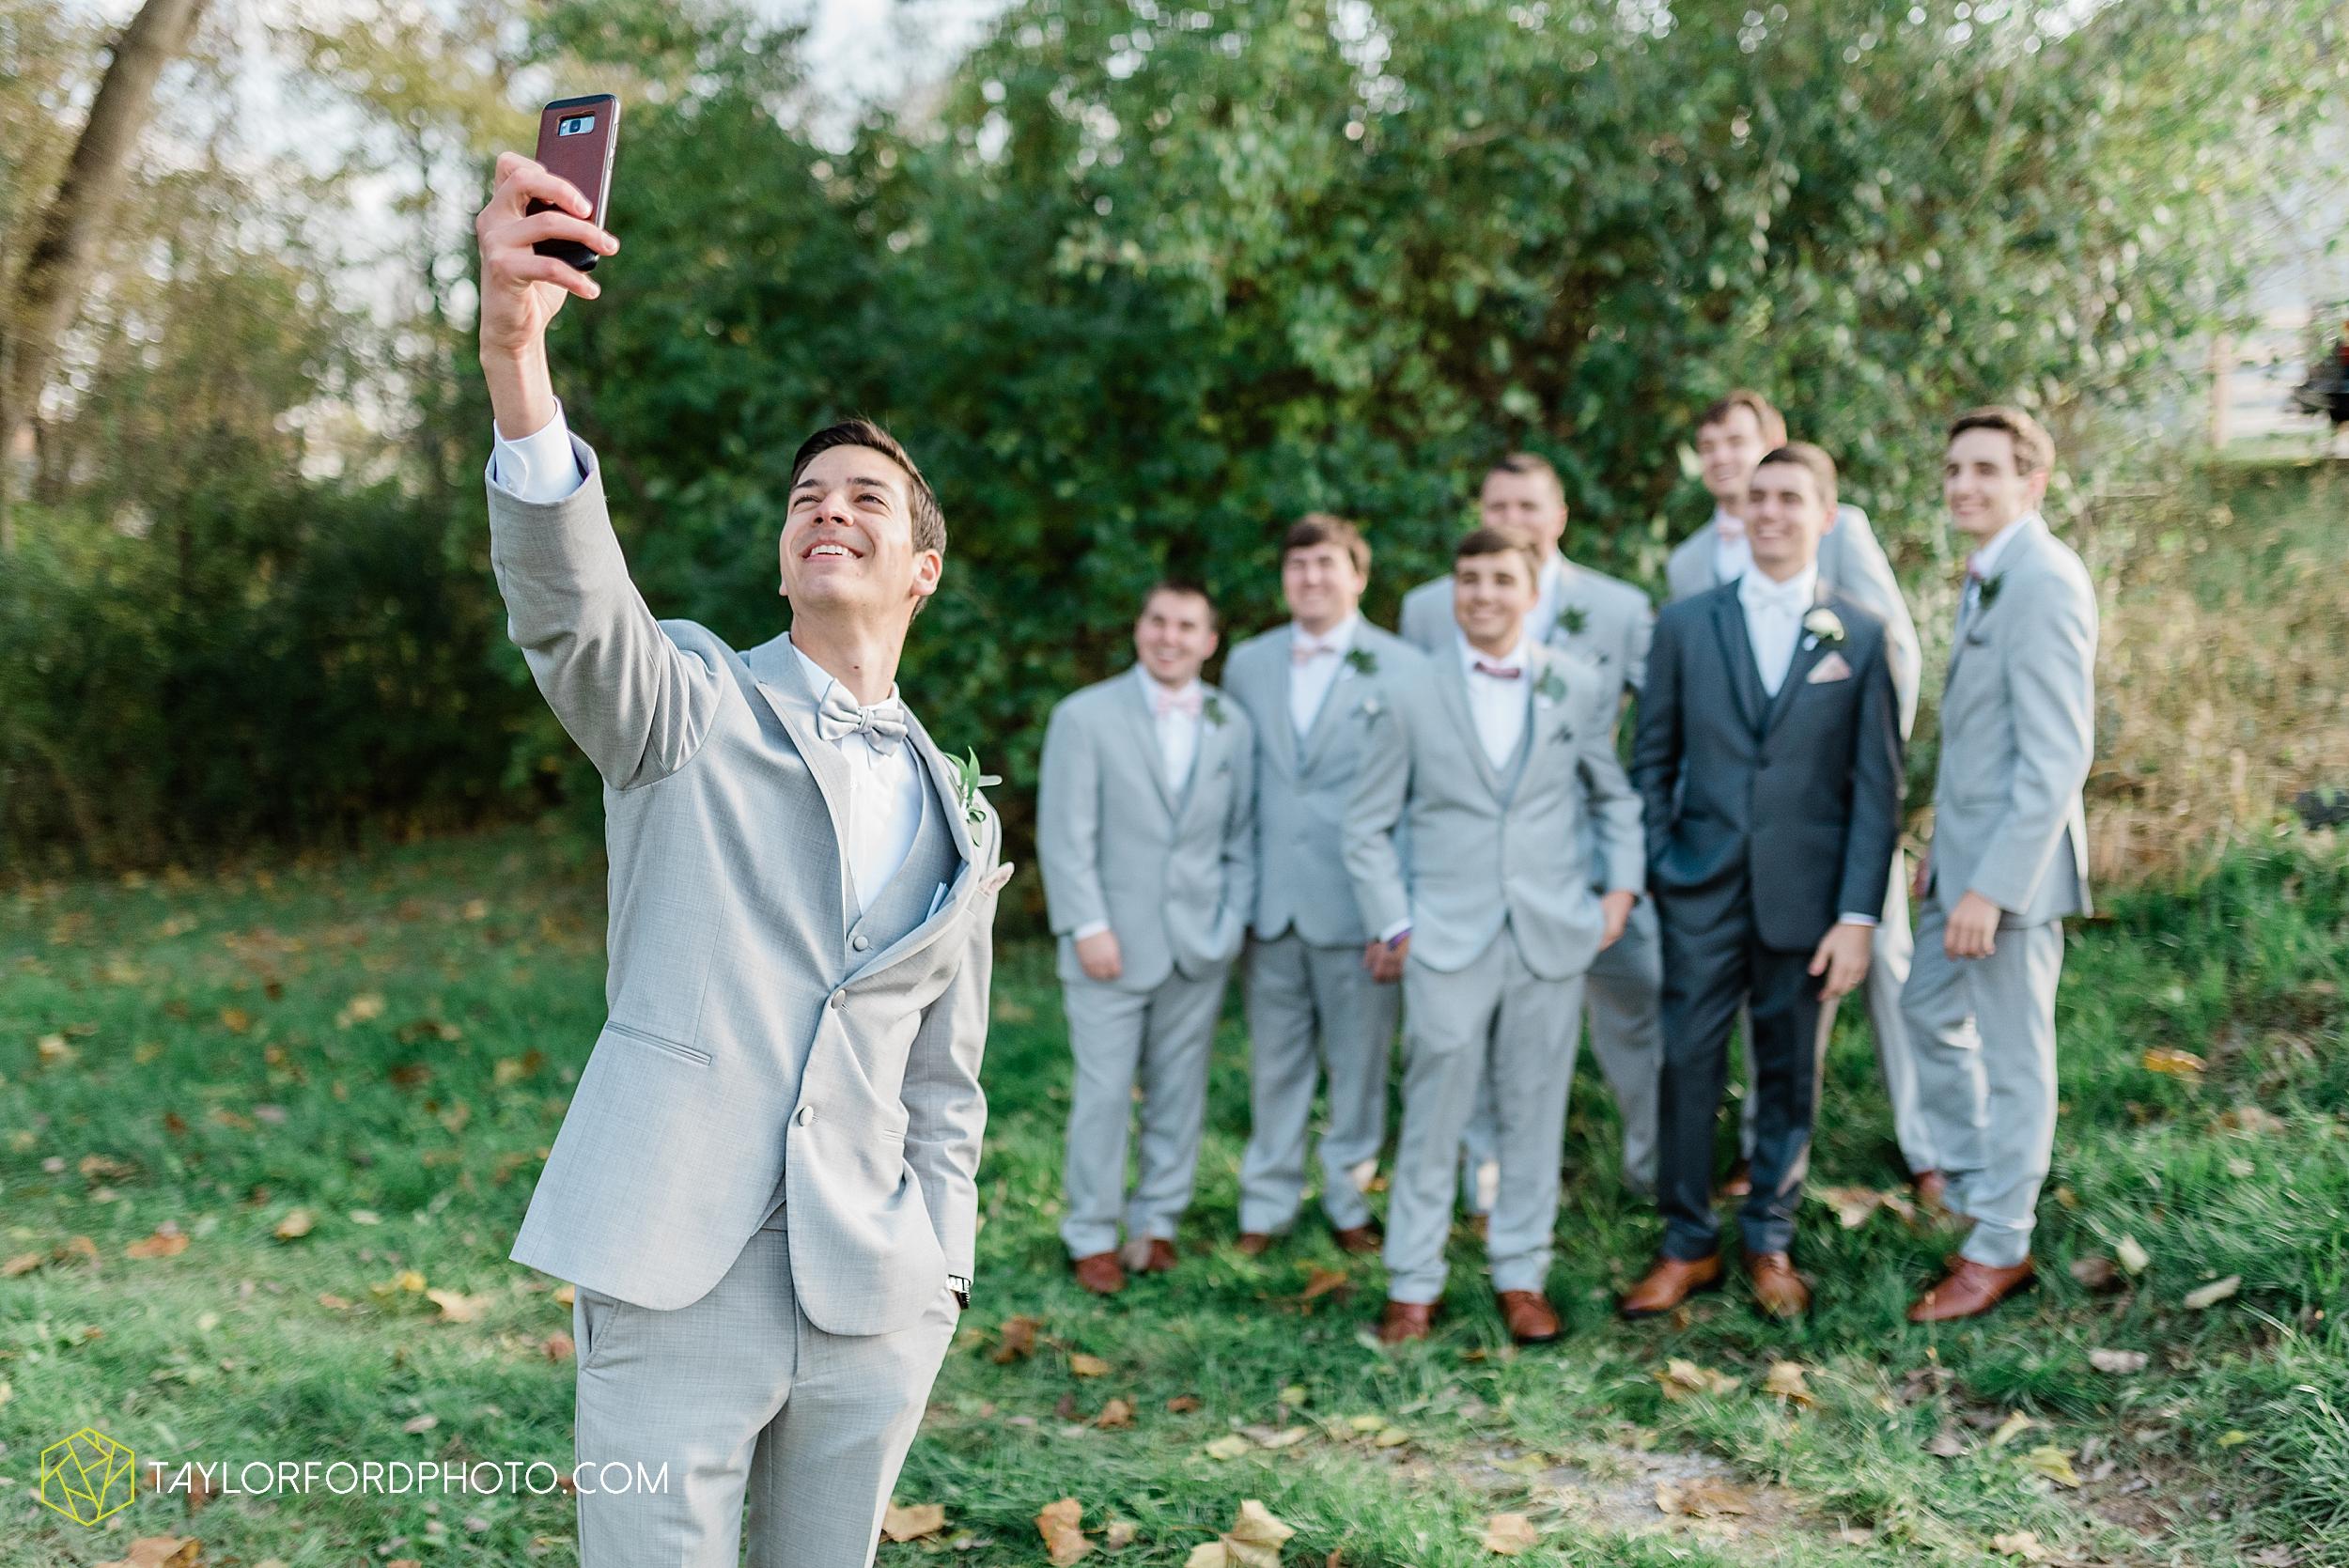 marissa-nicole-nick-daeger-orrmont-estate-farm-wedding-piqua-dayton-troy-ohio-fall-photographer-taylor-ford-photography_1540.jpg